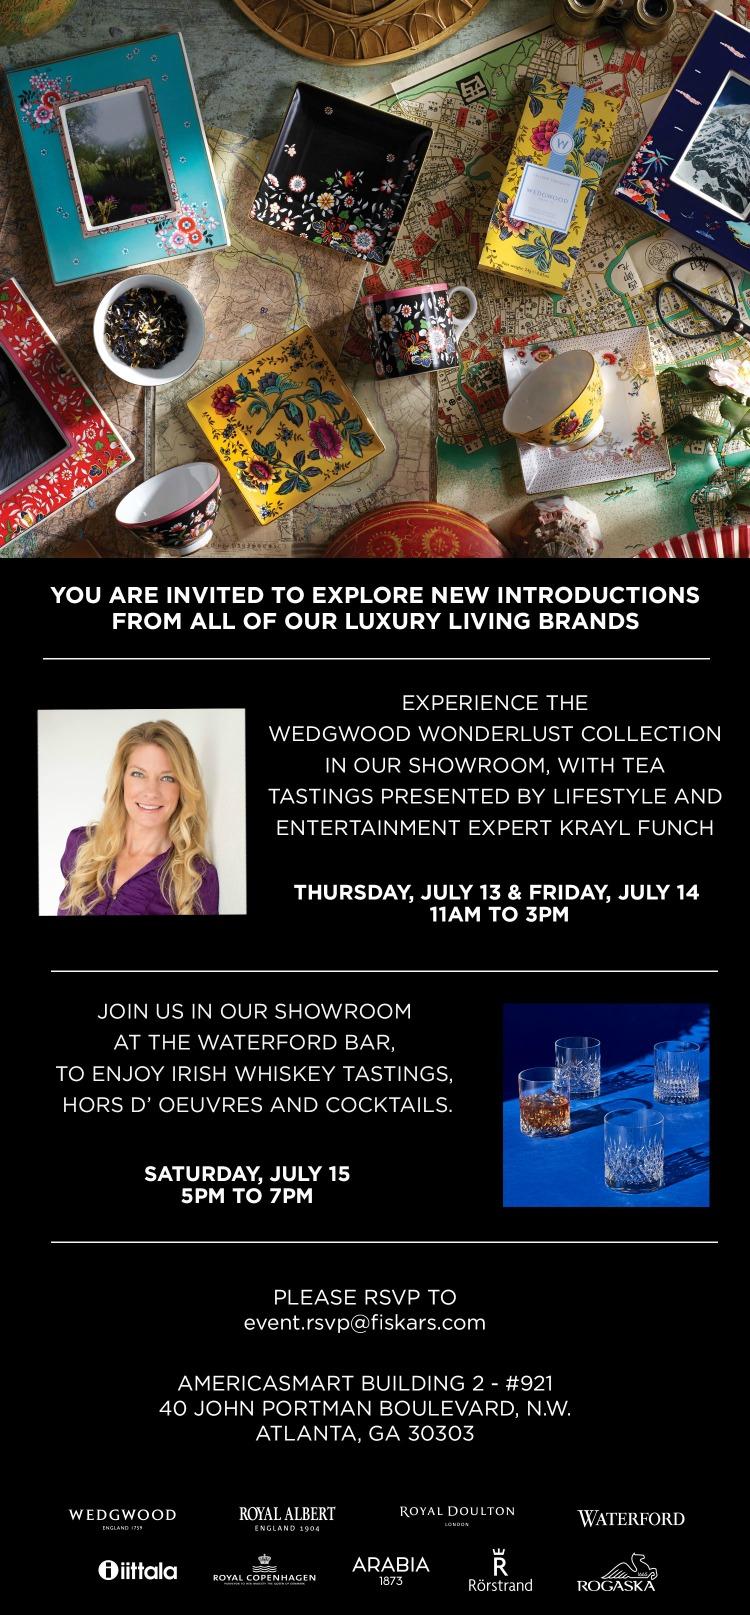 Atlanta Americas Mart Wedgwood Wonderlust Event Invite with Krayl Funch July2017